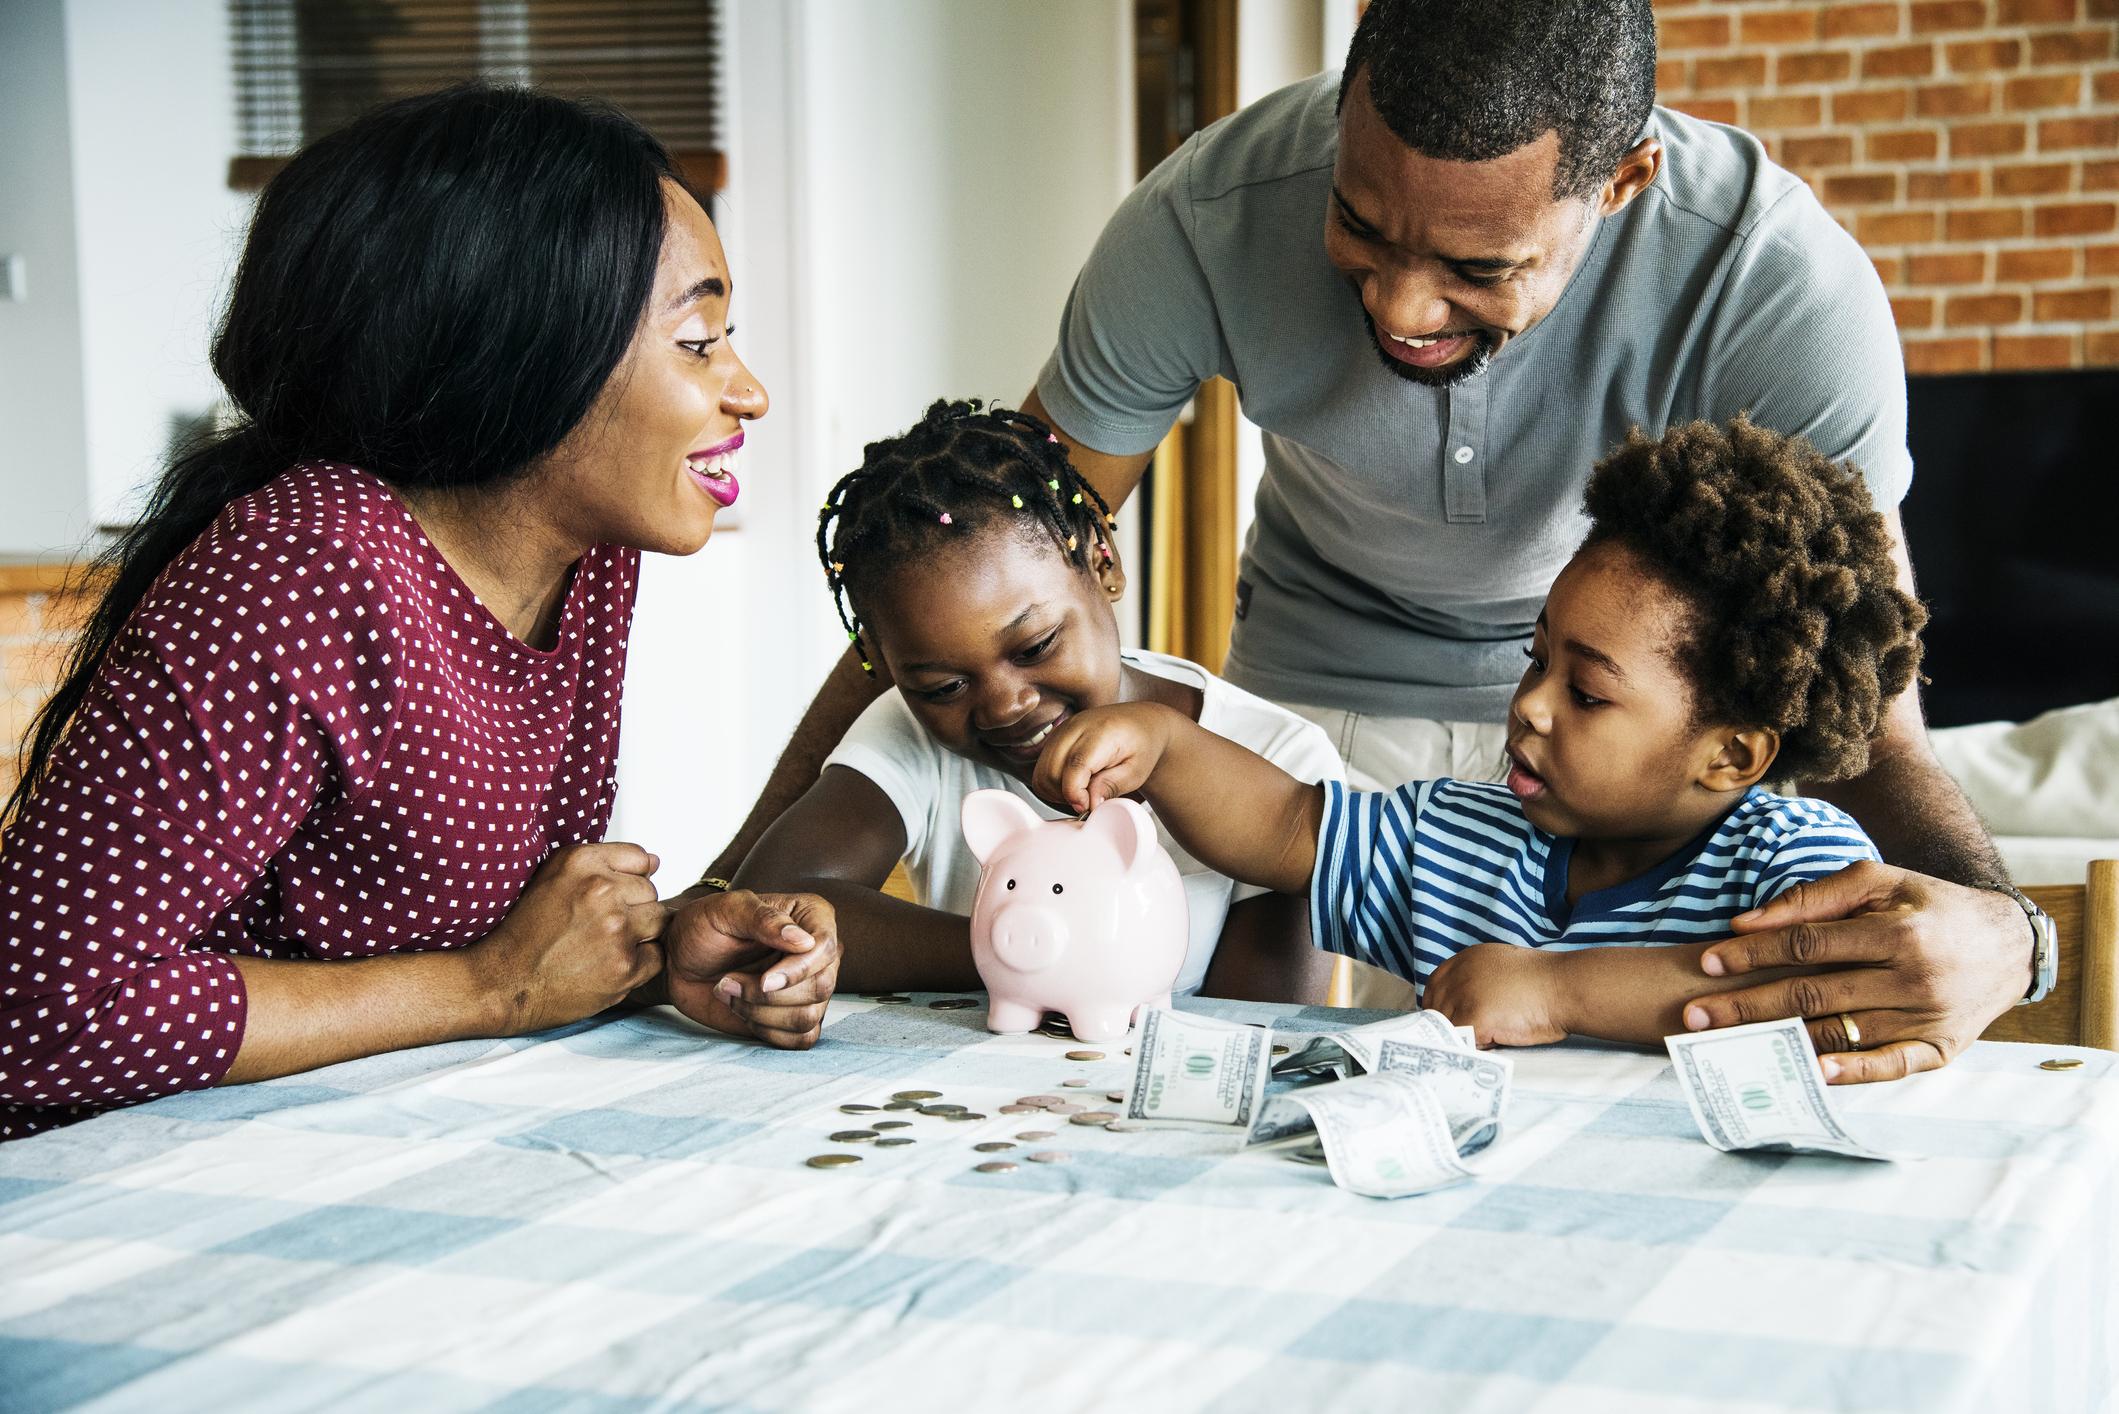 A family puts money into a piggy bank.